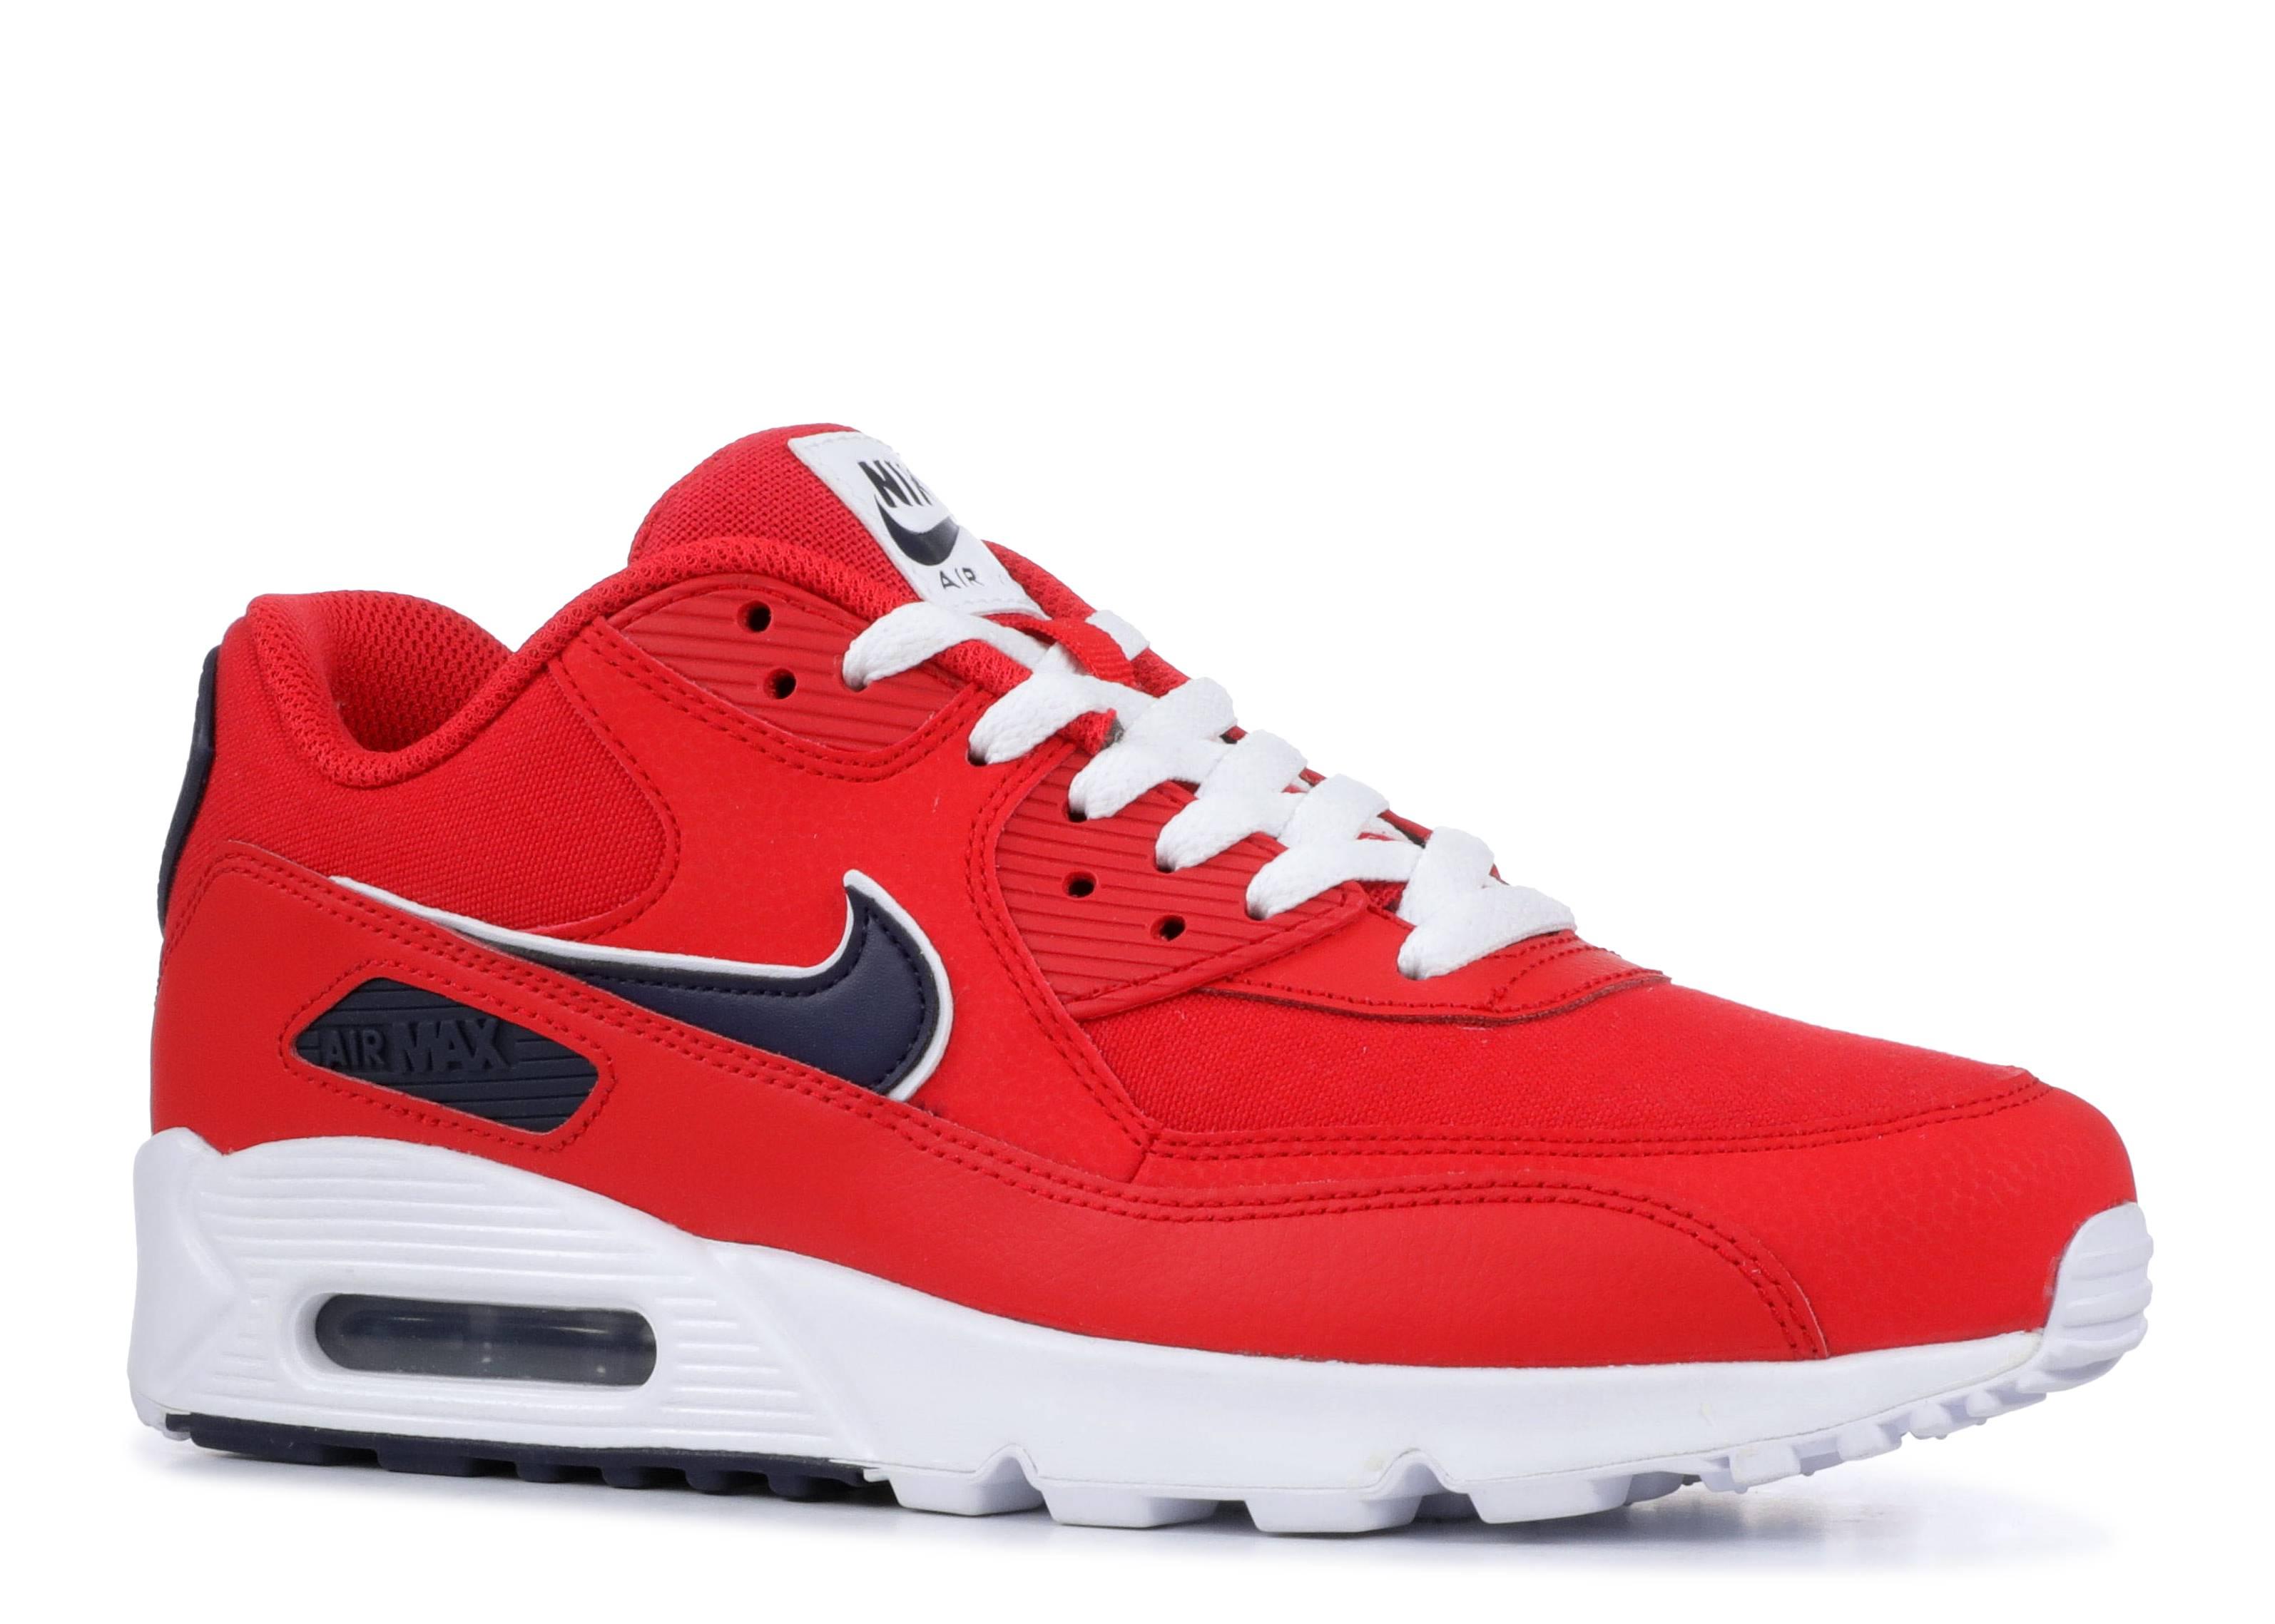 best website 28dae 6e6e5 Nike Air Max 90 Essential - Nike - aj1285 601 - university red blackened  blue-white   Flight Club